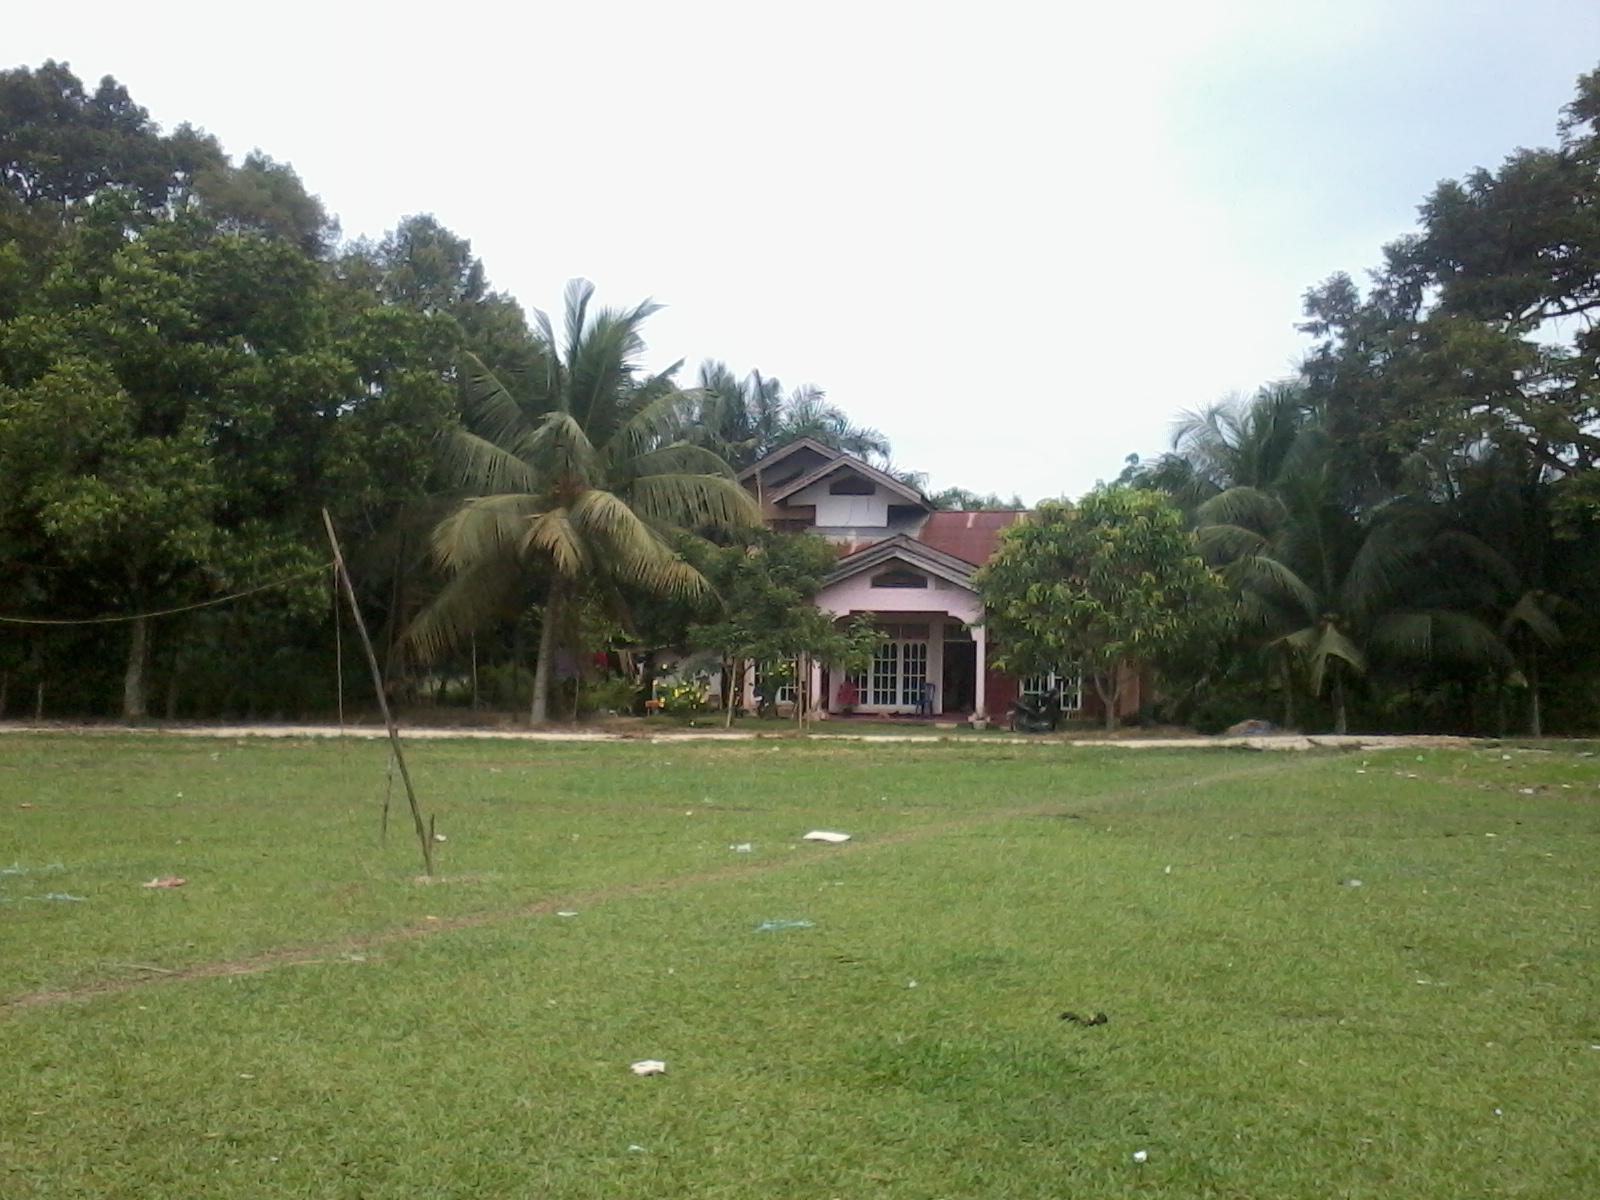 The latest tweets from home sweet home (@sweethomehorror). Berkas Home Sweet Home Panoramio 4 Jpg Wikipedia Bahasa Indonesia Ensiklopedia Bebas